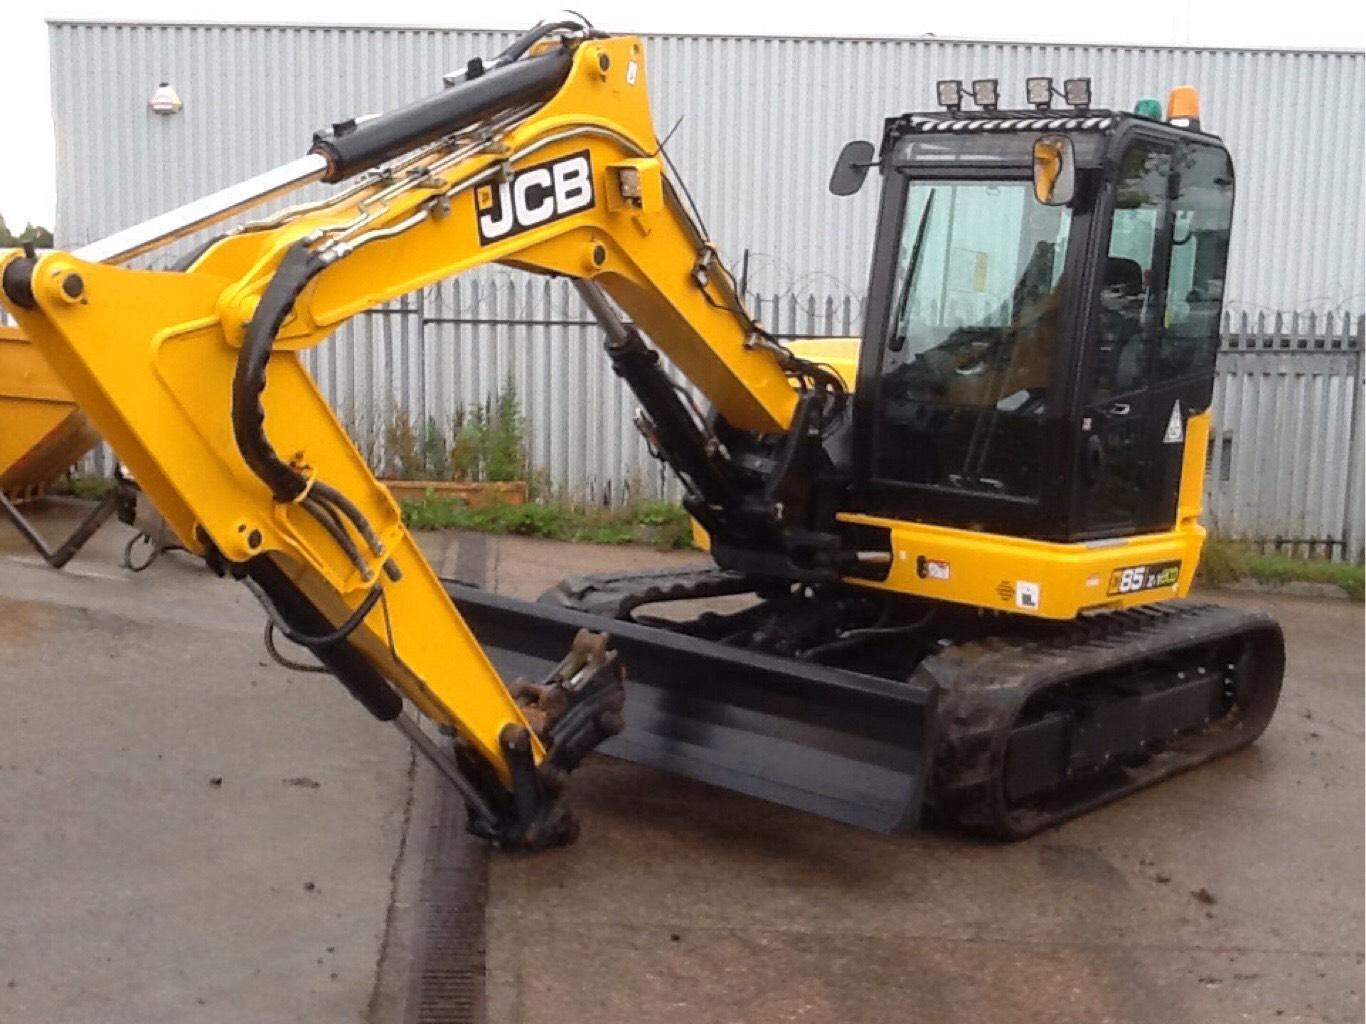 JCB Excavators   360 Excavators   Scot JCB